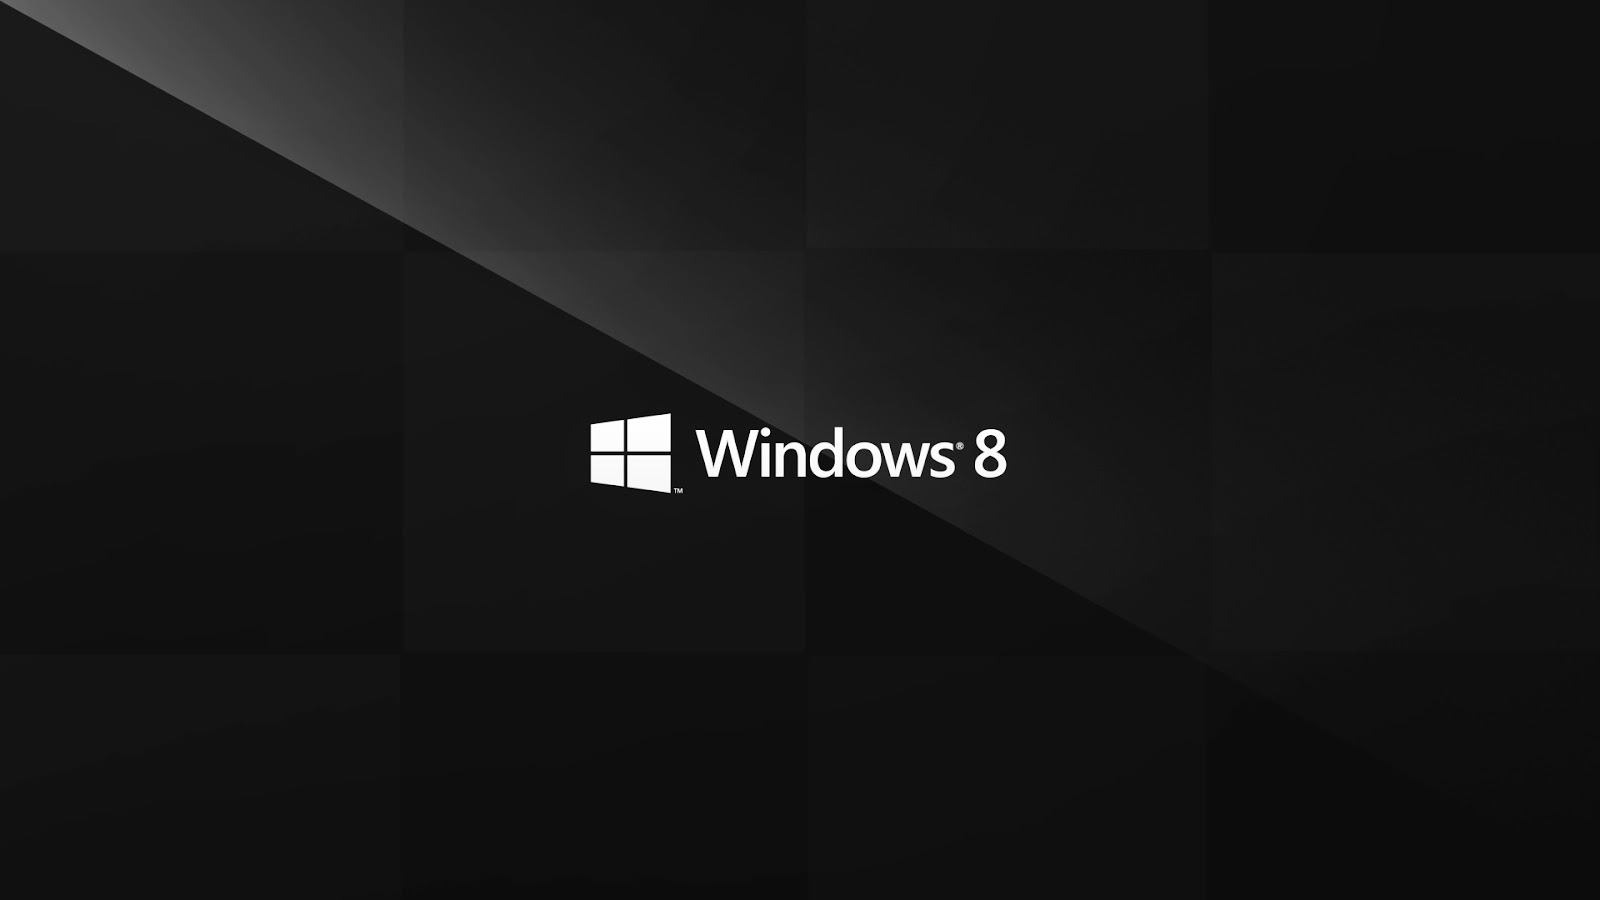 Windows-8-Black-glassy-theme-wallpaper-HD-free-download.jpg